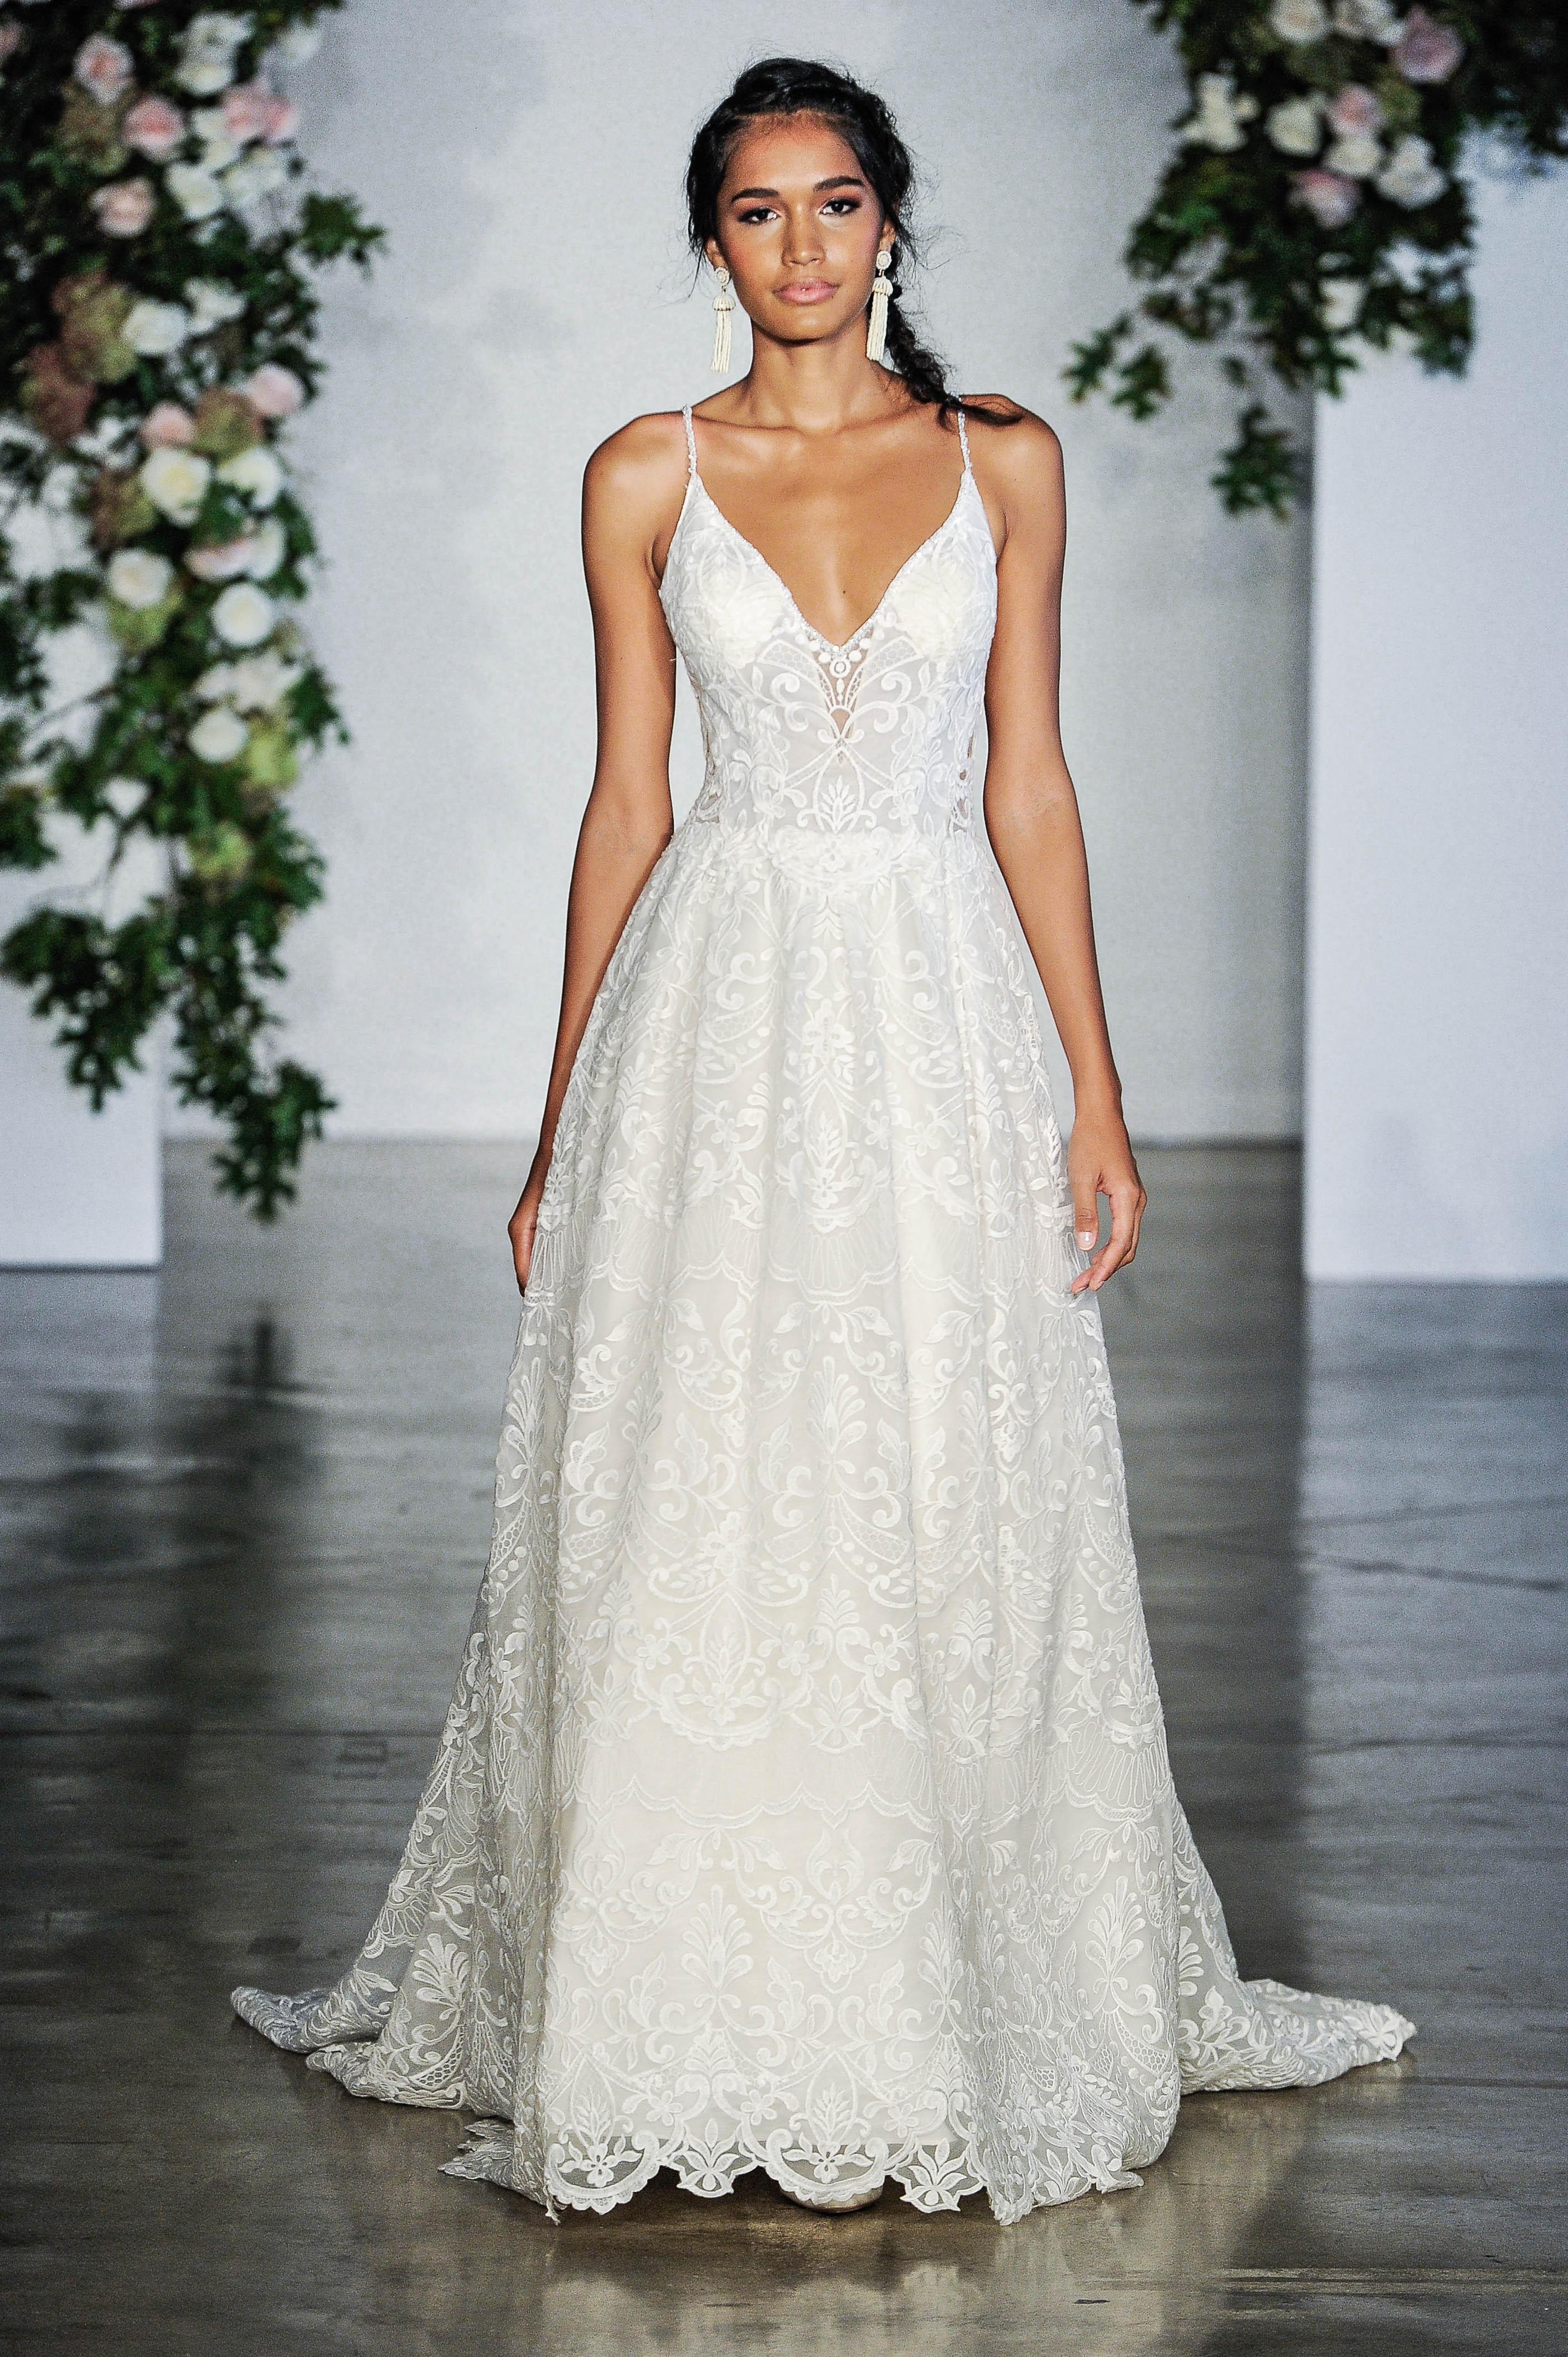 Morilee Wedding Dresses.Morilee By Madeline Gardner Fall 2018 Wedding Dress